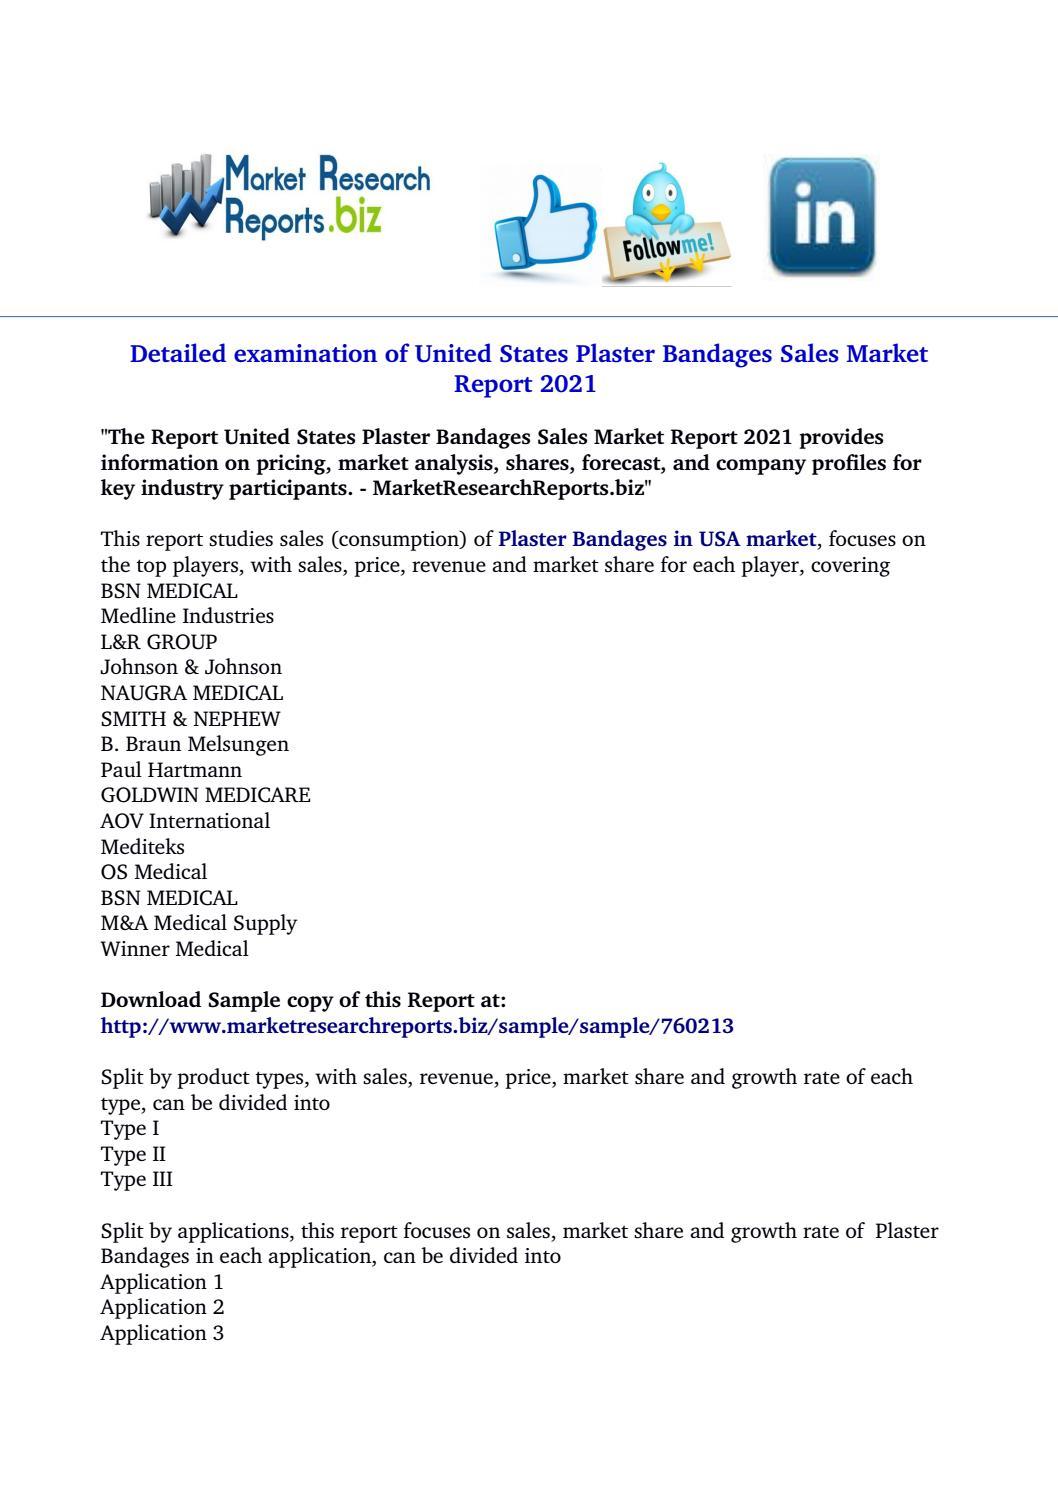 United states plaster bandages sales market report 2021 by roshani